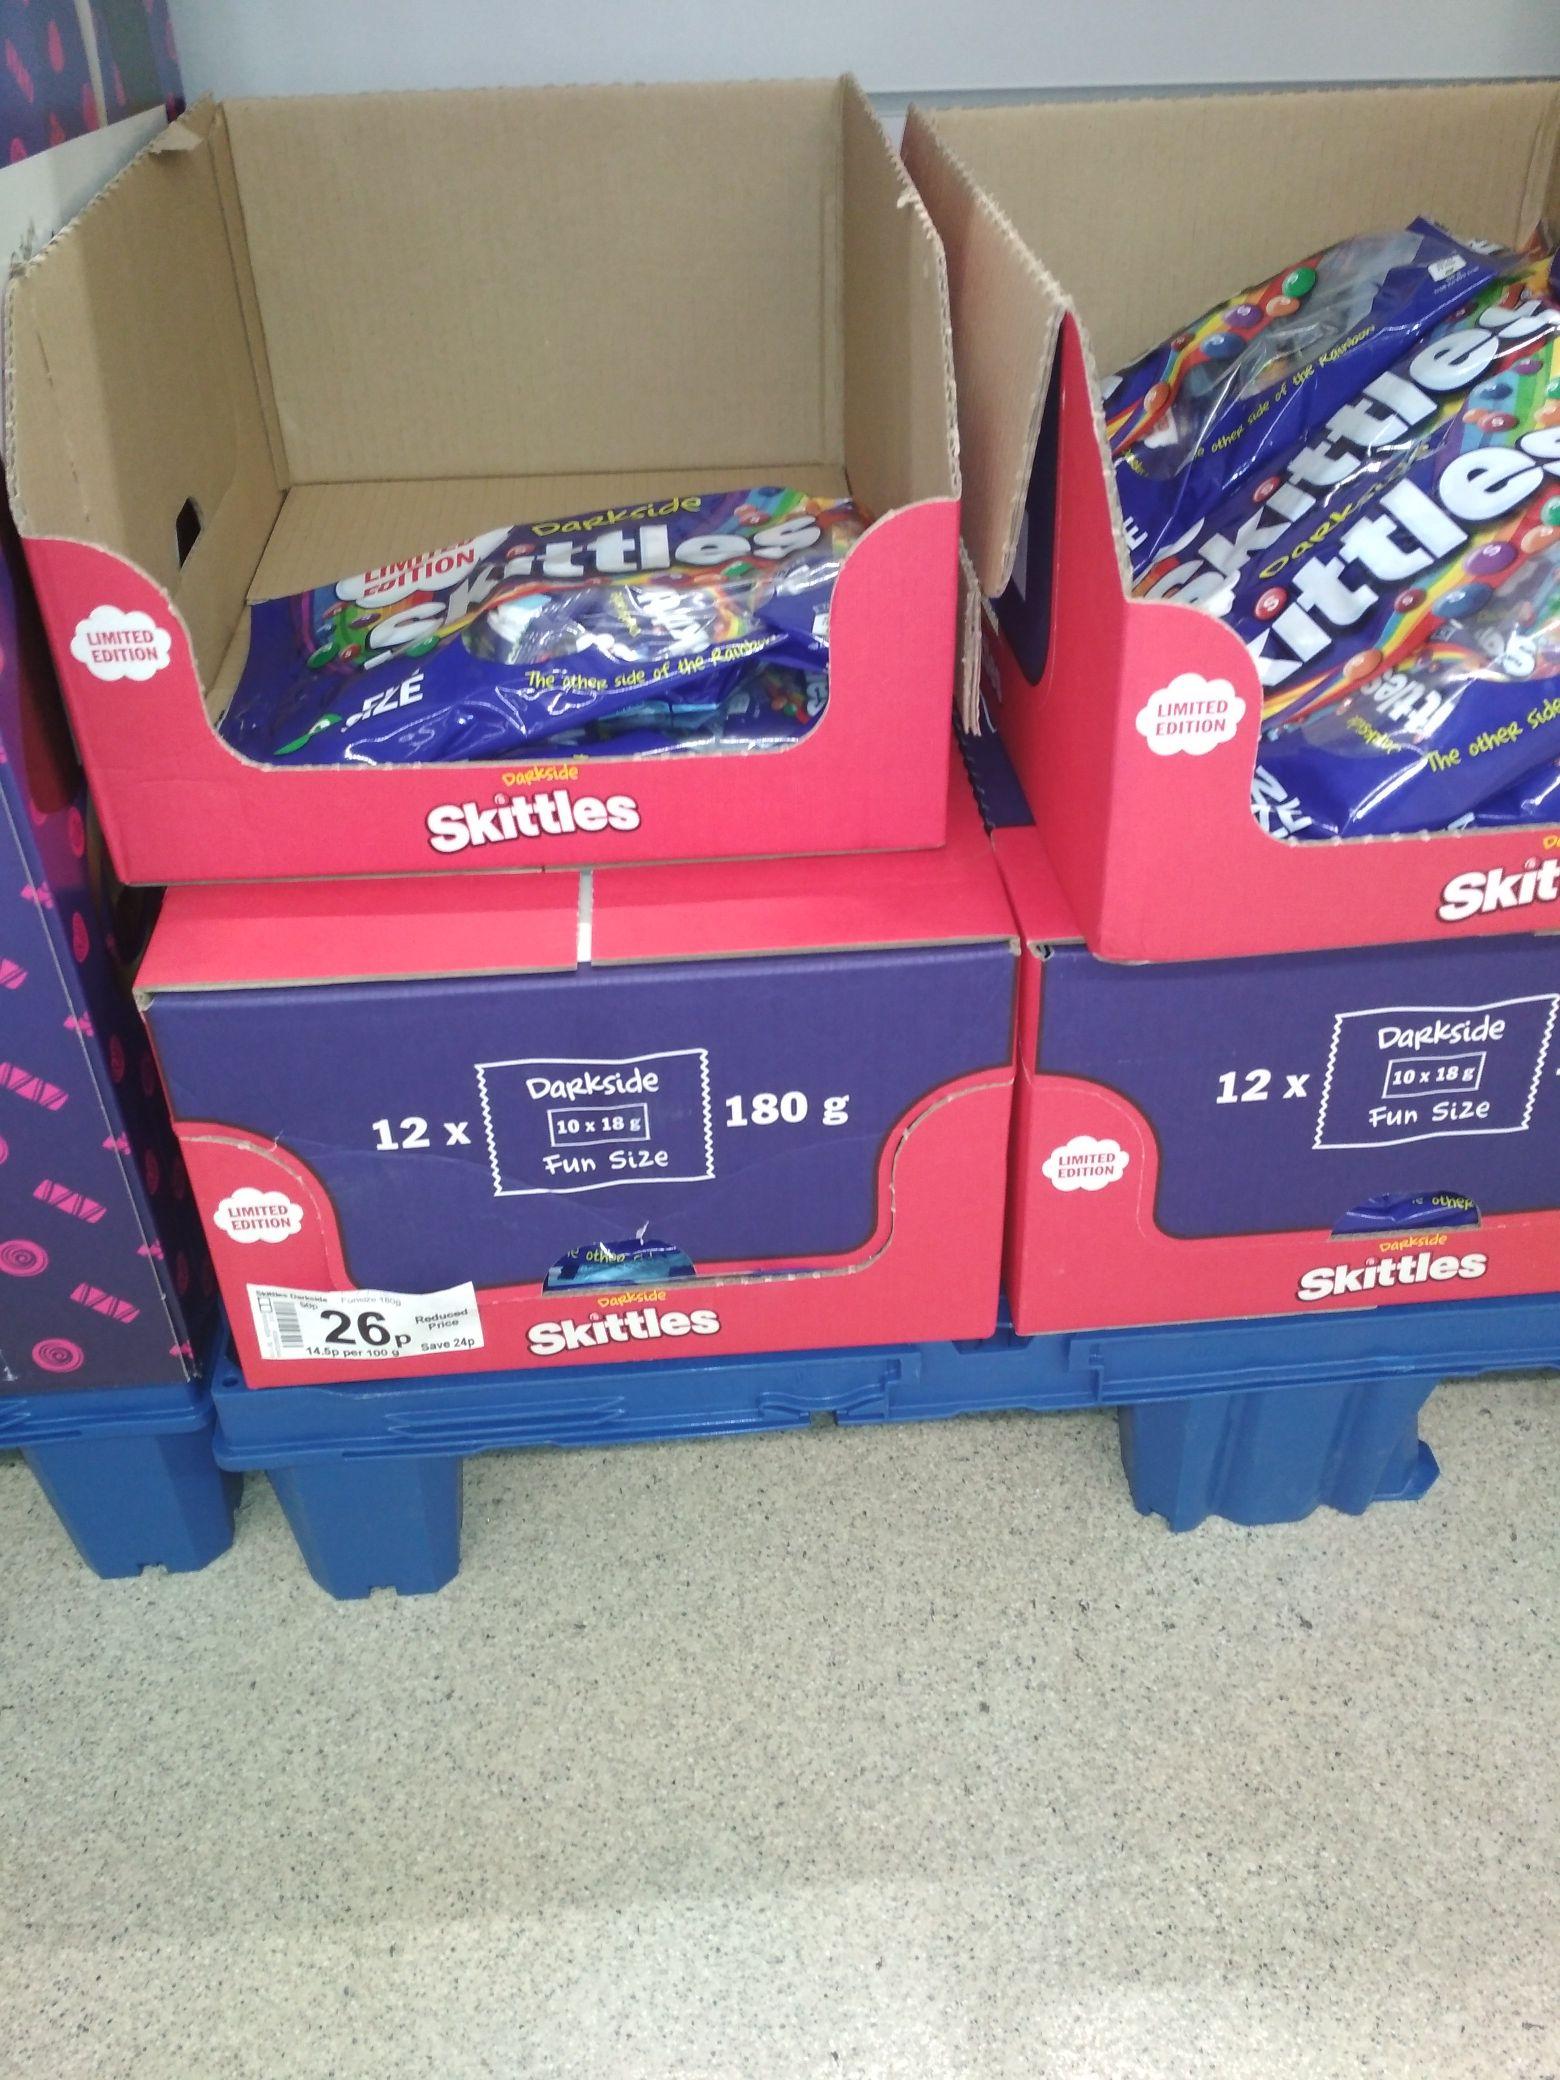 Skittles dark fruits fun size bags (10 bags) 26p @ Asda Folkestone